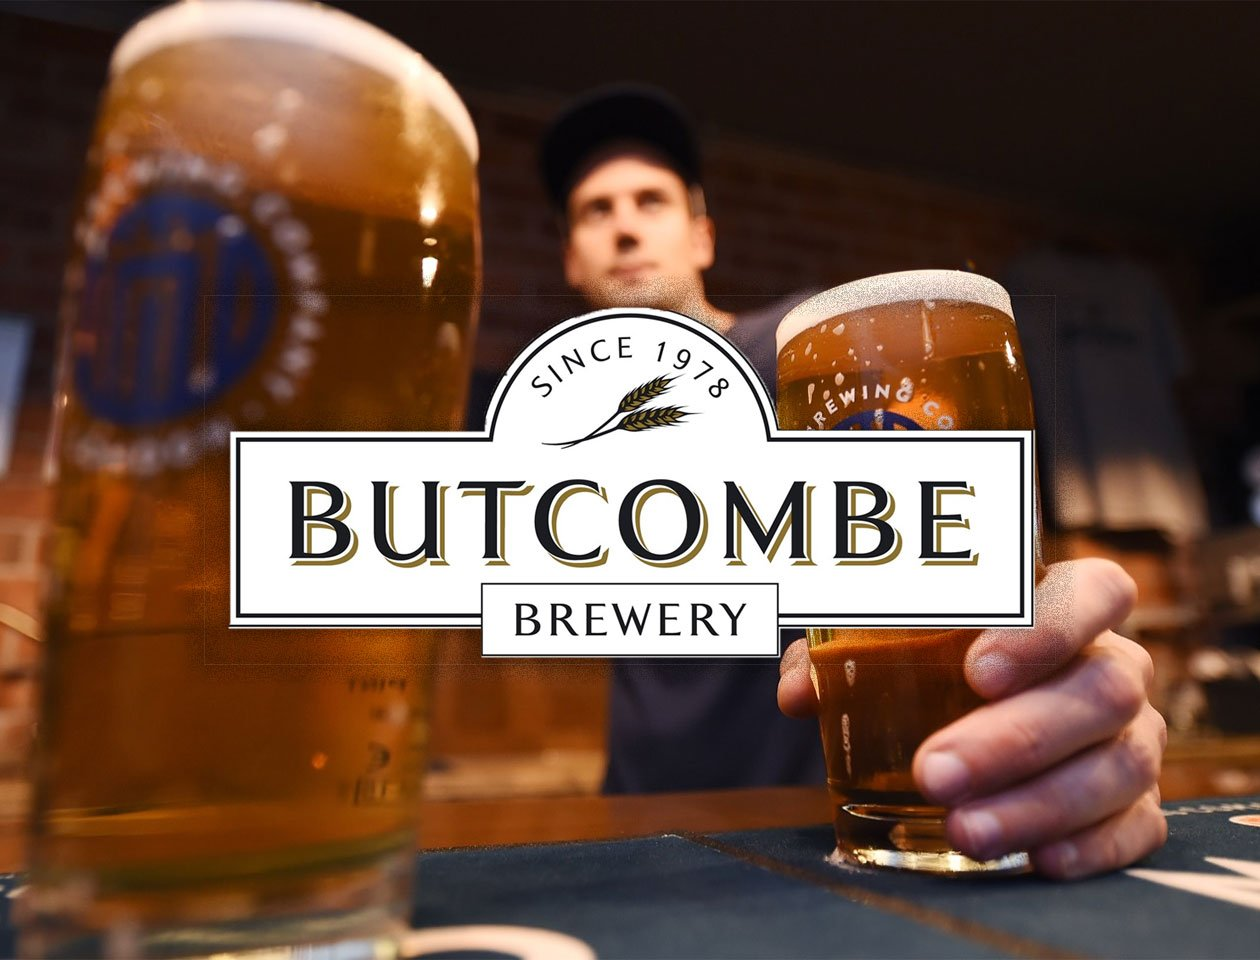 butcome-brewery